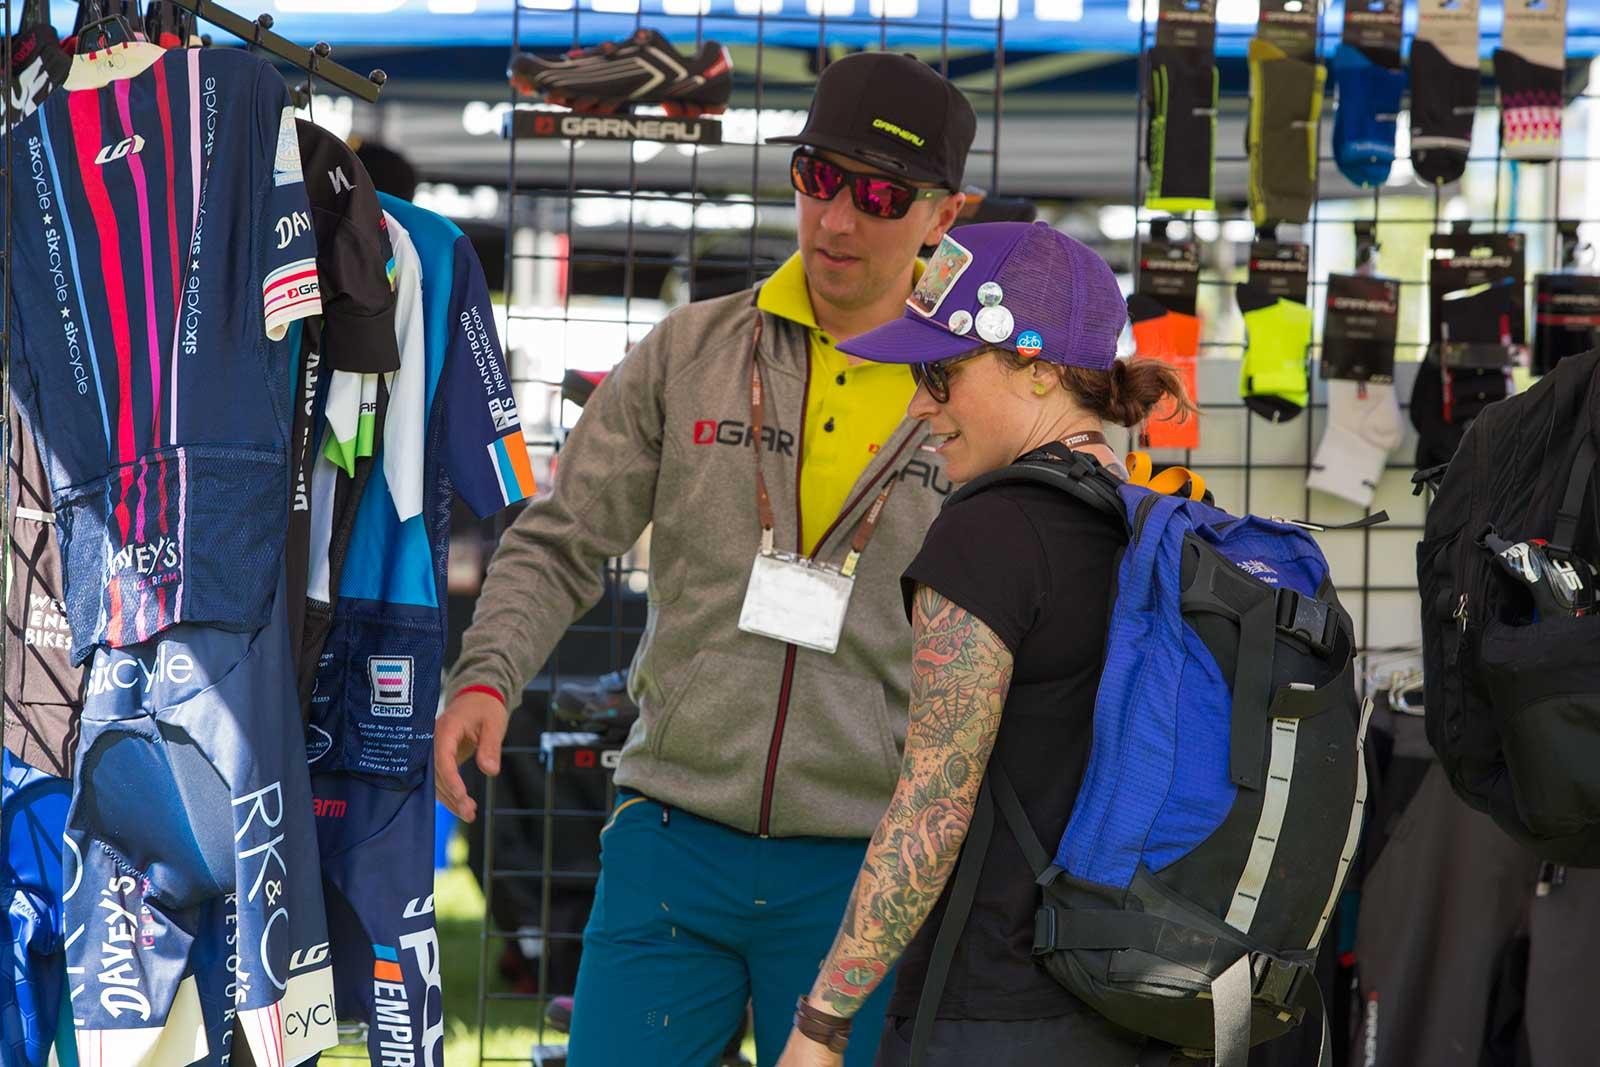 Garneau at the SaddleDrive 2015 expo